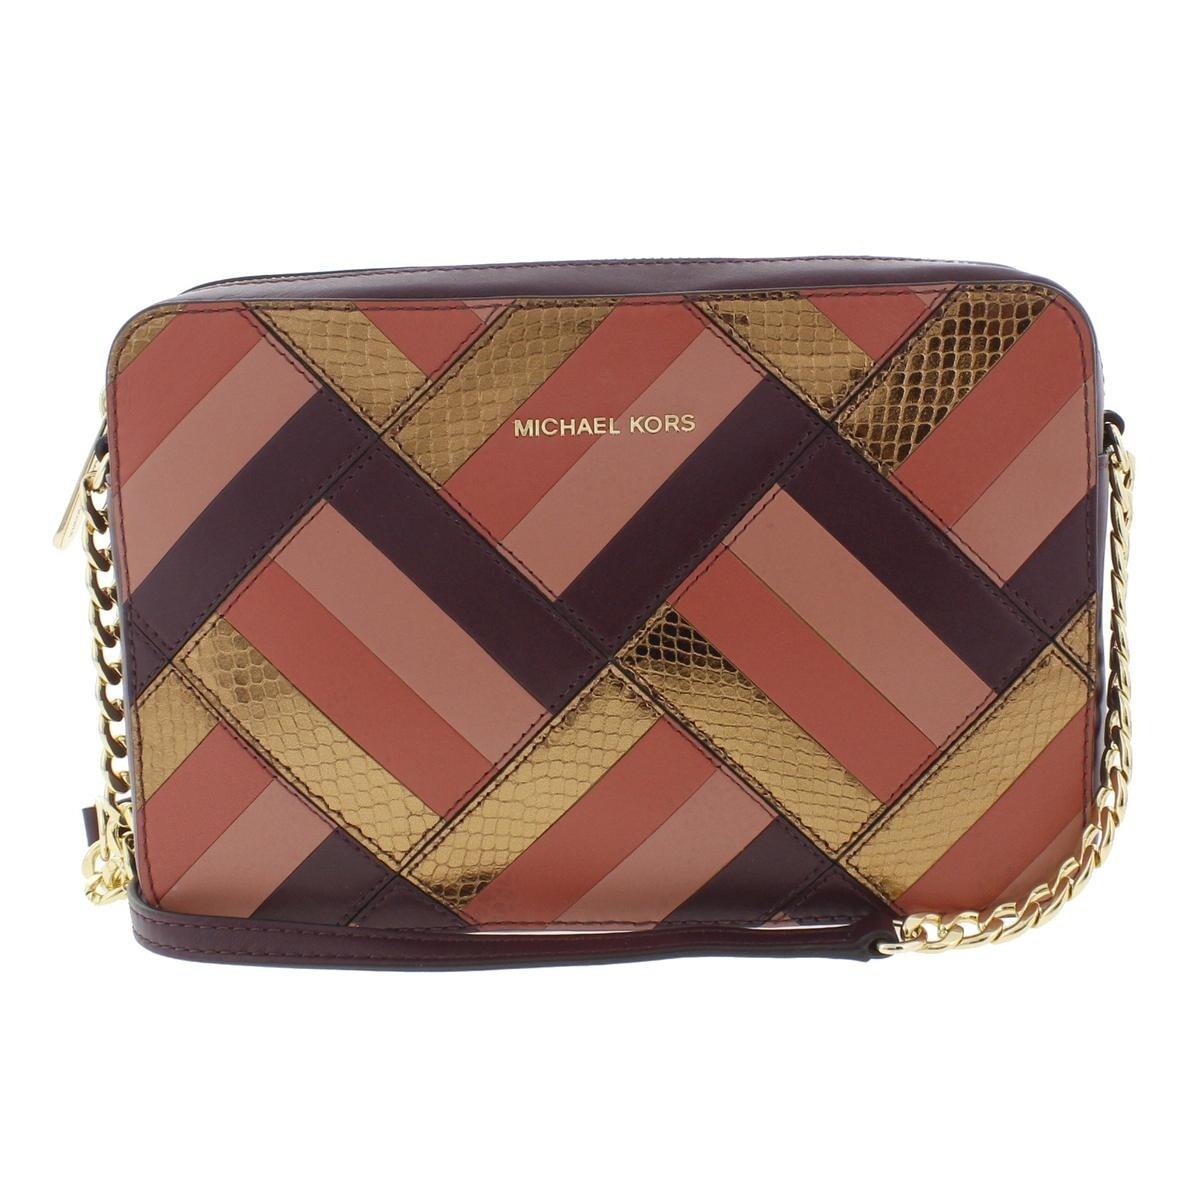 2a3b375b0b78 Michael Kors Womens Marquetry Crossbody Handbag Leather Patchwork - small